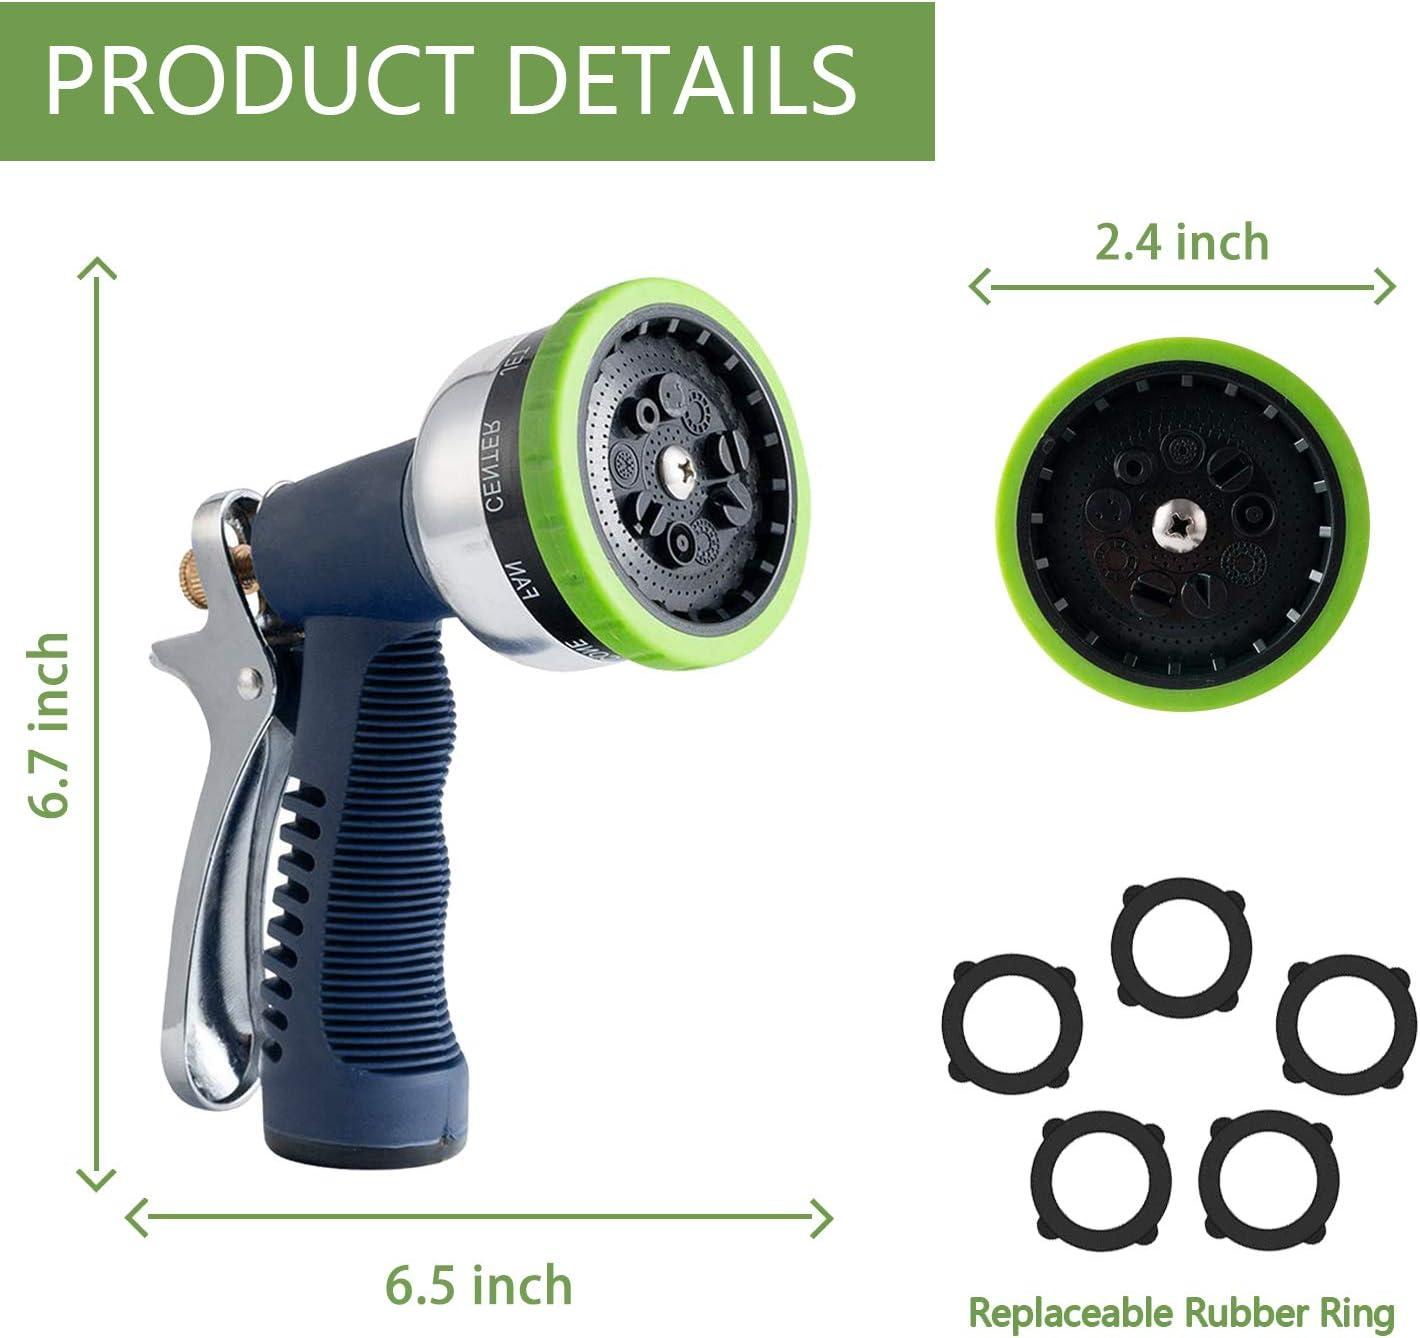 Hose Nozzle Garden, Hose Nozzle Heavy Duty Metal Hose Spray 9 Adjustable Patterns Water Jet Pistol Grip Trigger for Hand Watering Plants & Lawn, Car Washing, Garden and Patio/Pets Shower & More : Garden & Outdoor